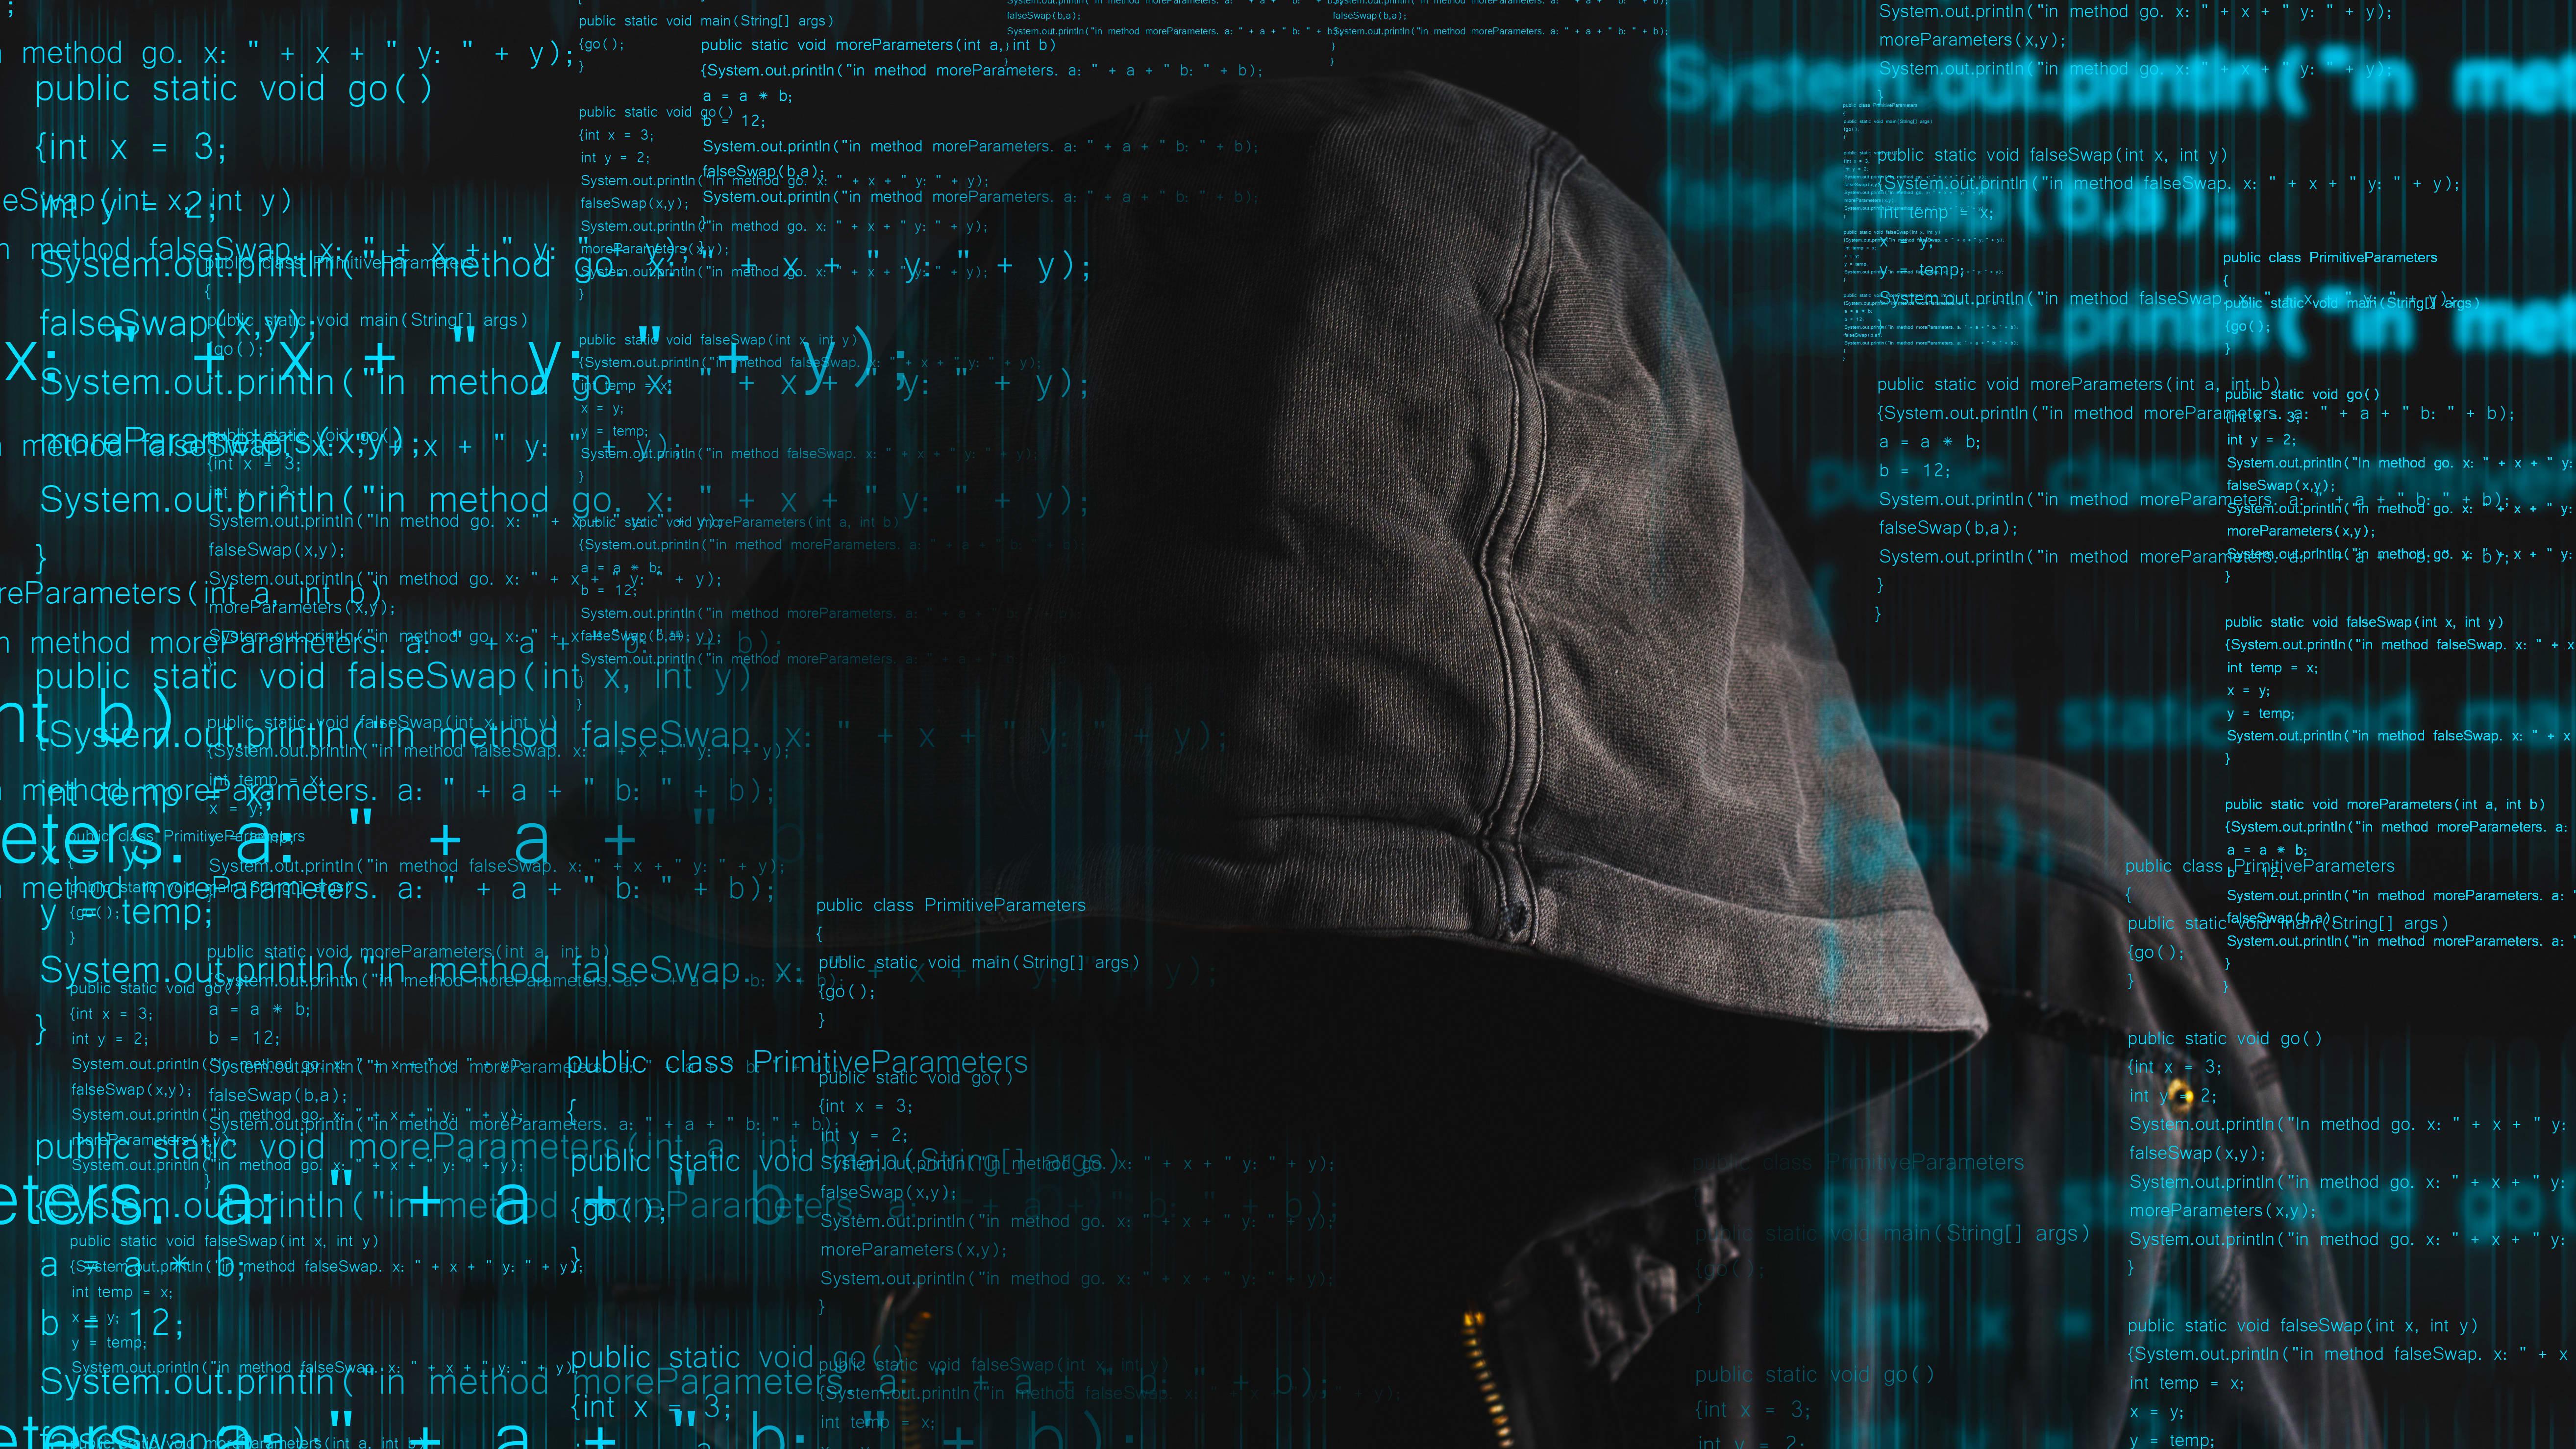 darknet search gidra